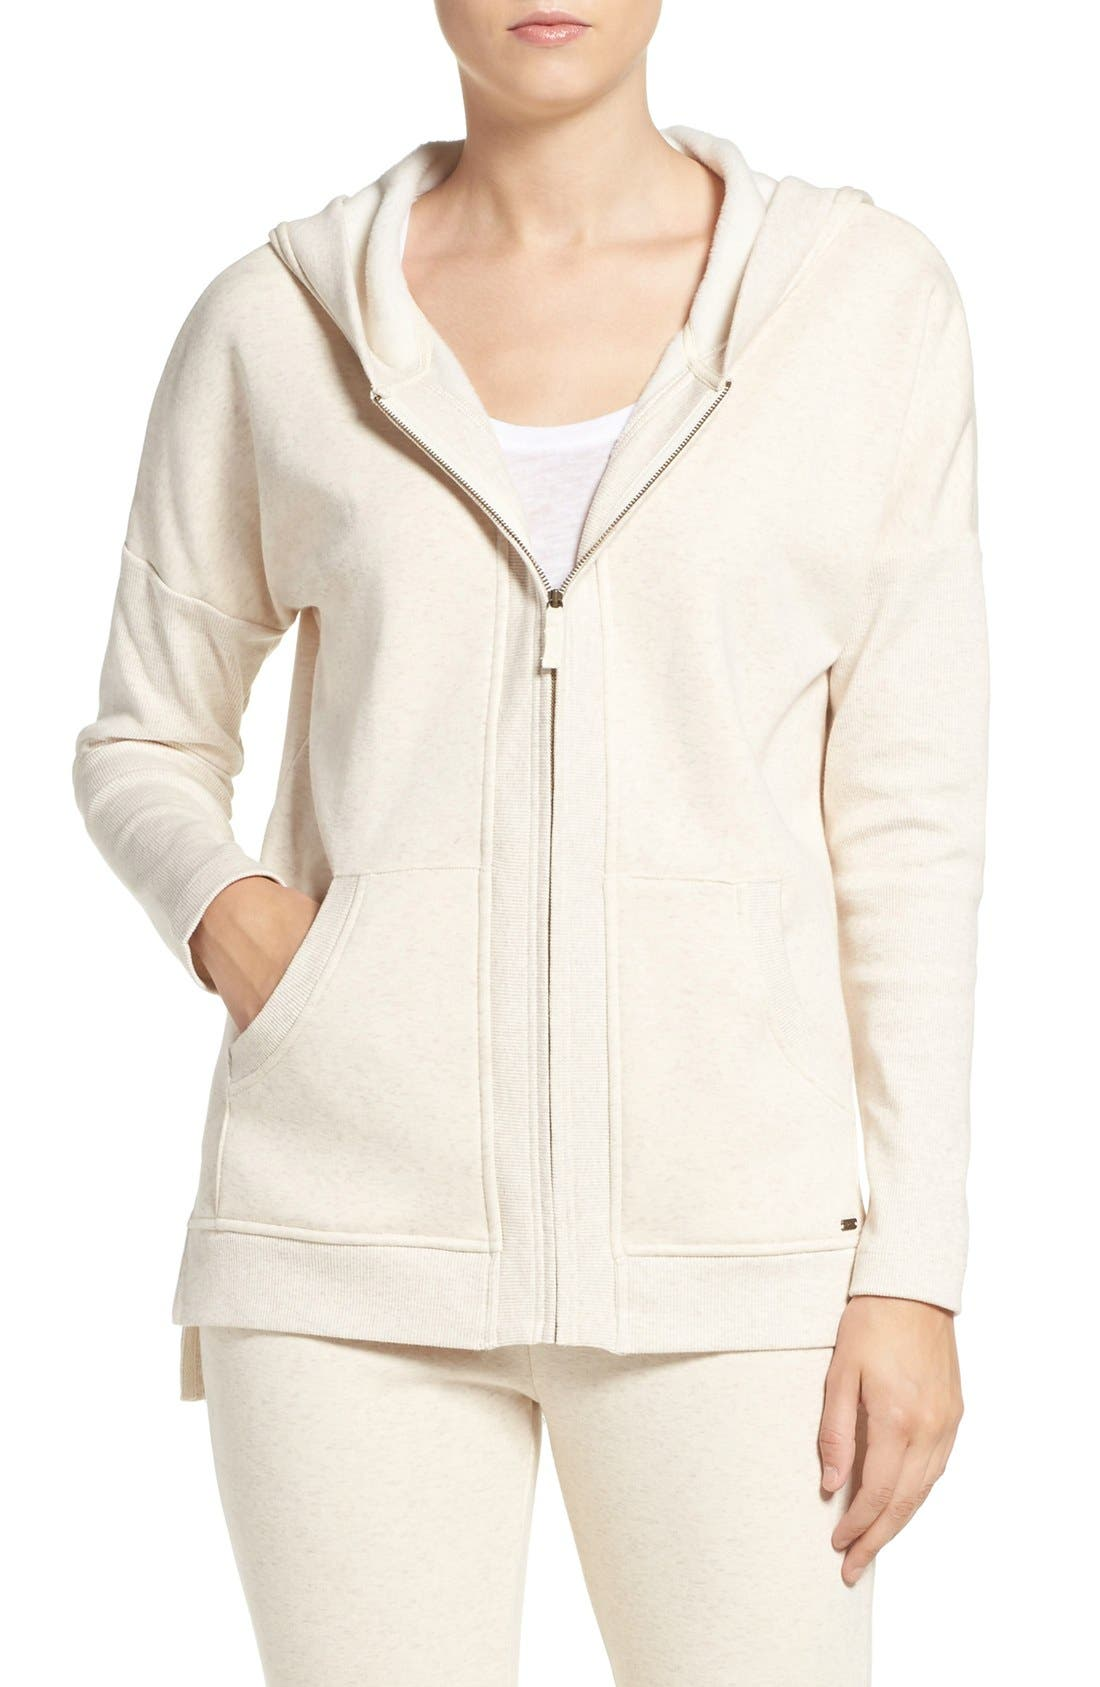 Alternate Image 1 Selected - UGG® 'Mavis' Stretch Cotton Zip-Up Hoodie